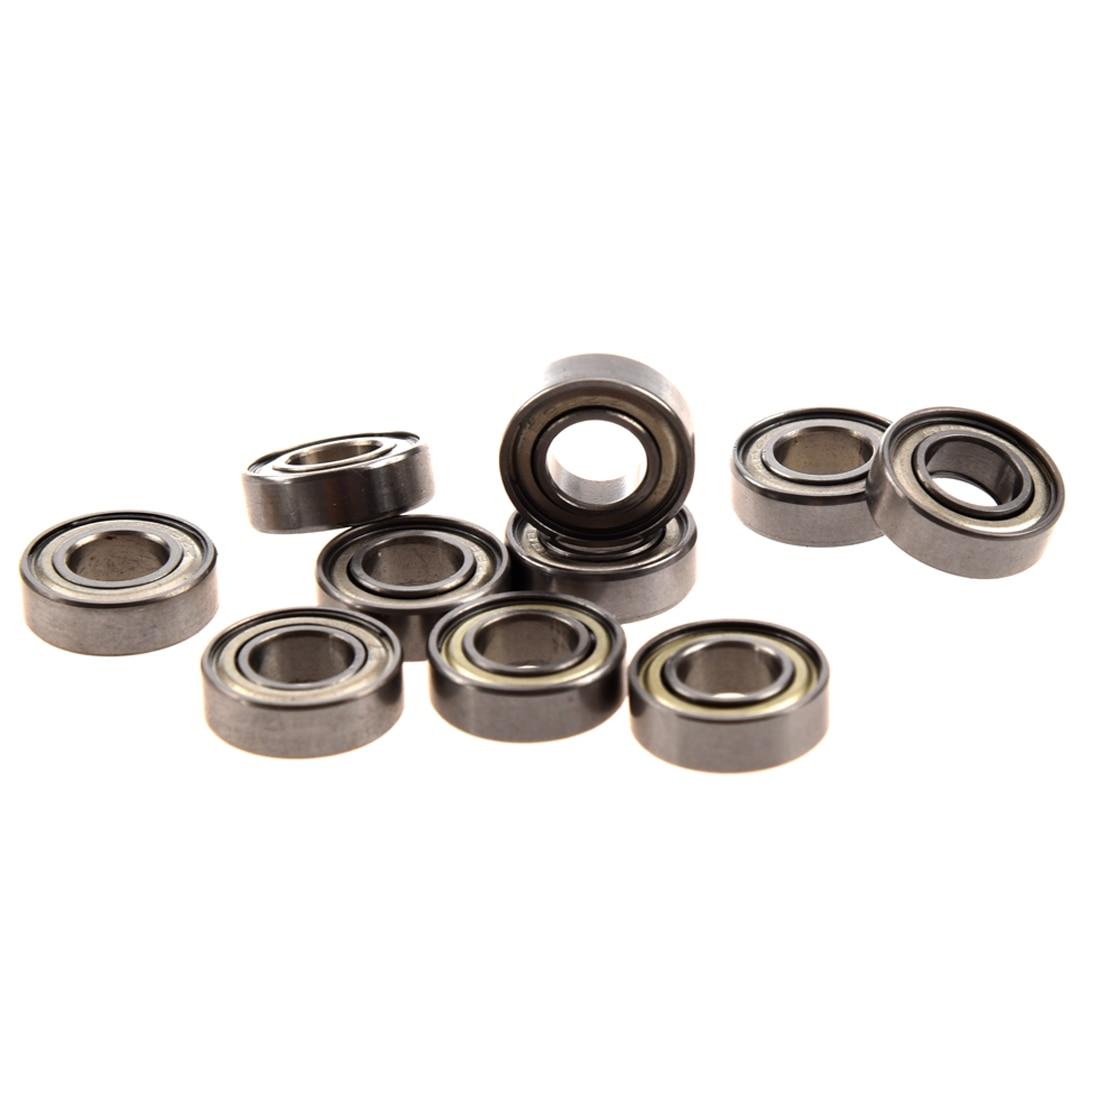 Wholesales 10 Pcs 698Z 8 x 19 x6mm Single Row Sealed Deep Groove Ball Bearings